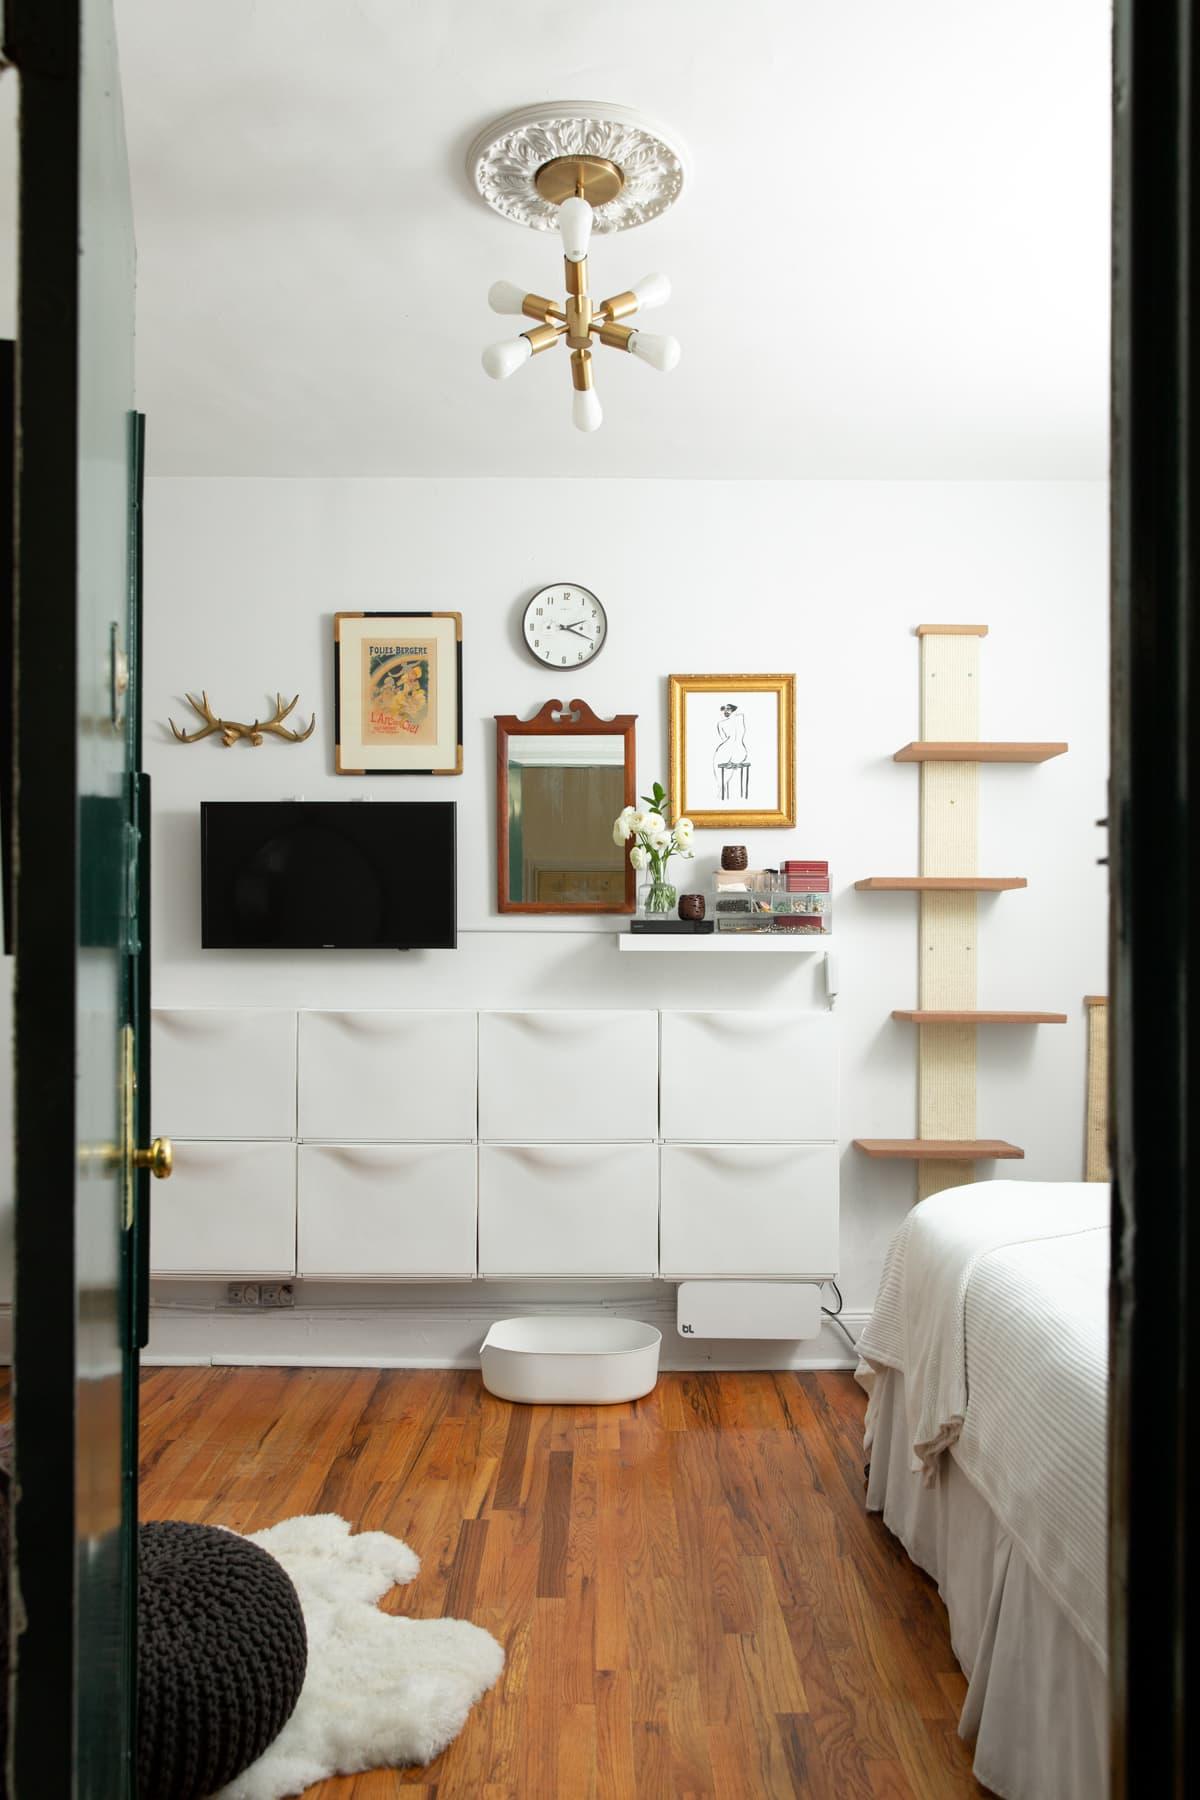 Small Studio Apartment Organizing Advice and Ideas ... on Small Apartment Organization  id=69003